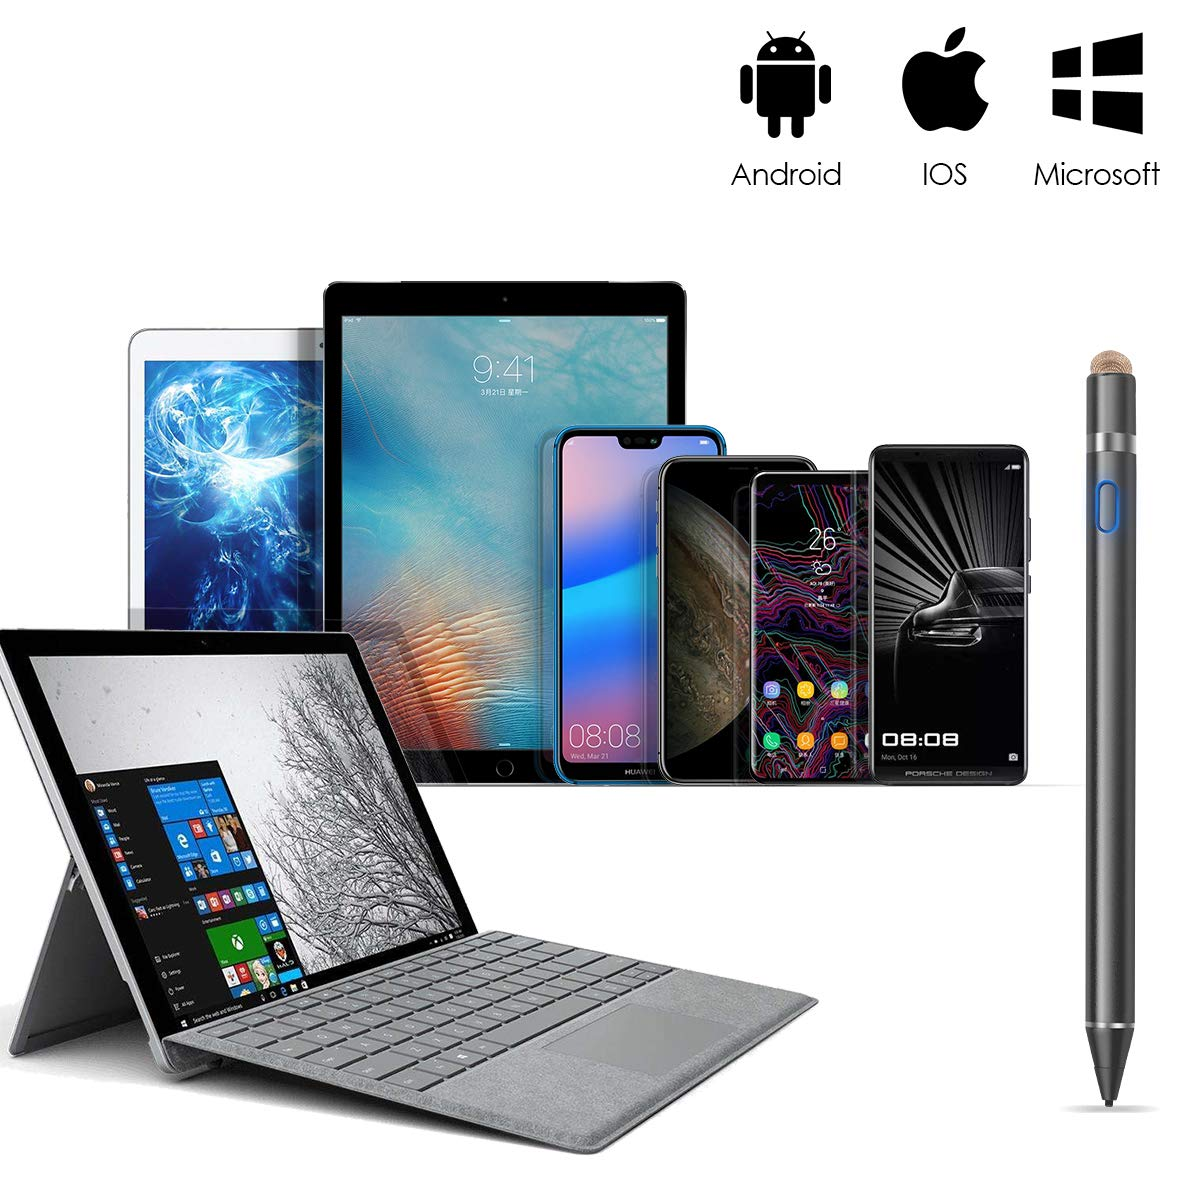 iPad iPhone Samsung Huawei L/ápiz /Óptico Activo Punta Fina 1.8mm para Android Sotical Veamor L/ápiz T/áctil Tablet Negro Tel/éfono Tableta Dispositivos de Pantalla T/áctil